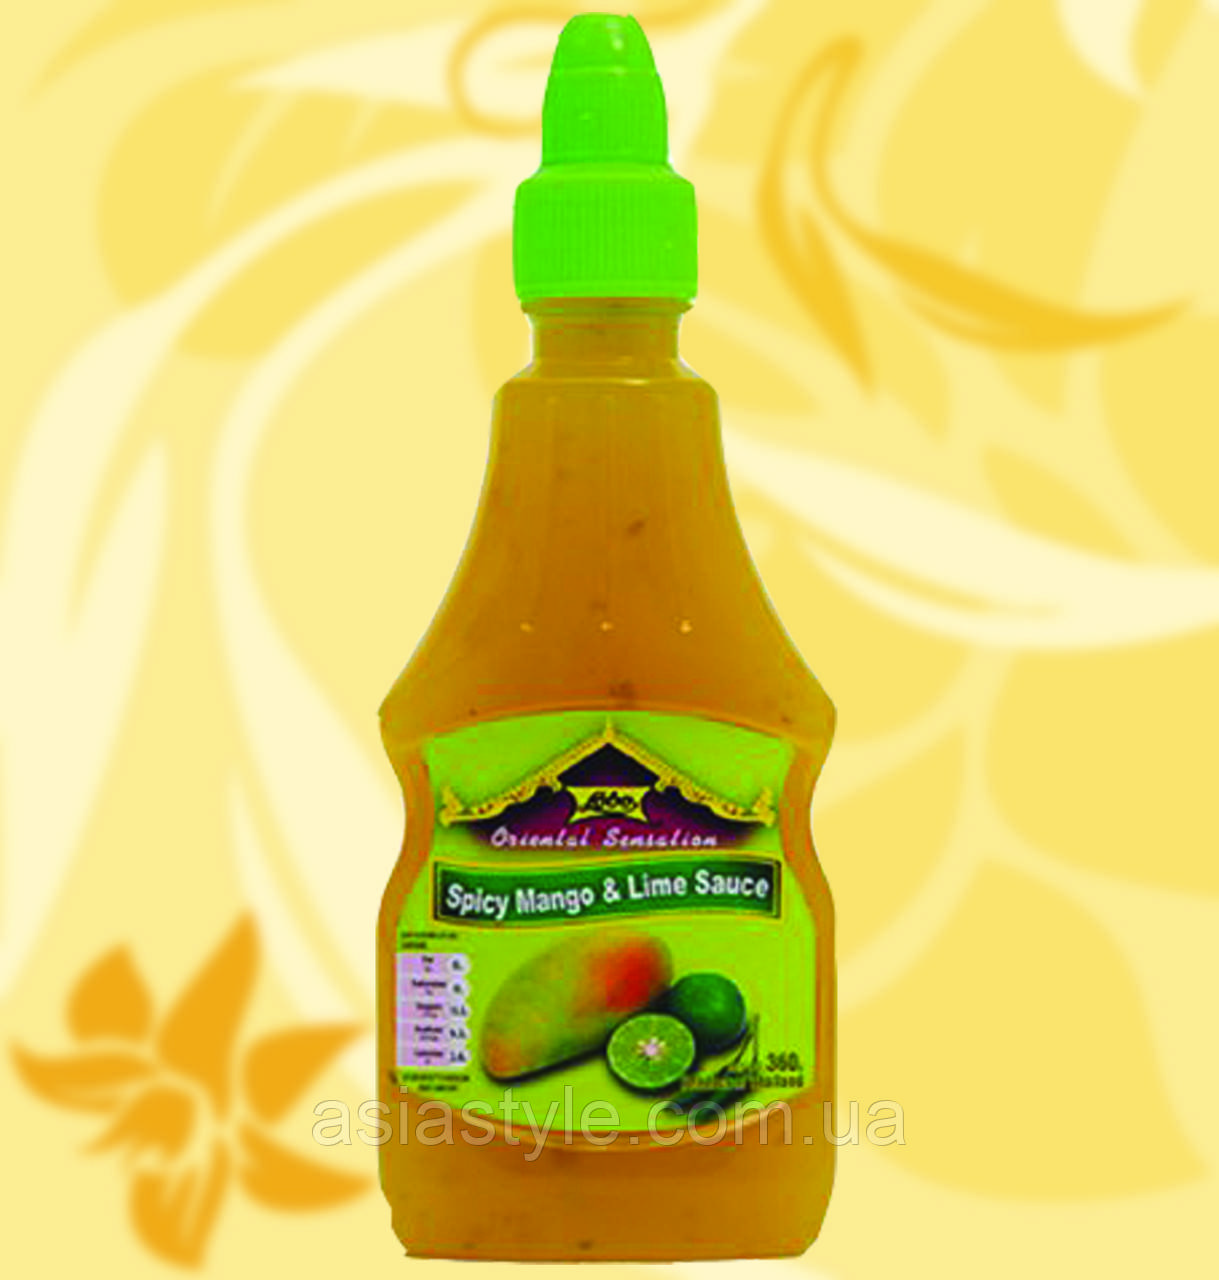 Соус манго-лайм з чилі, Lobo, 300мл, RДж